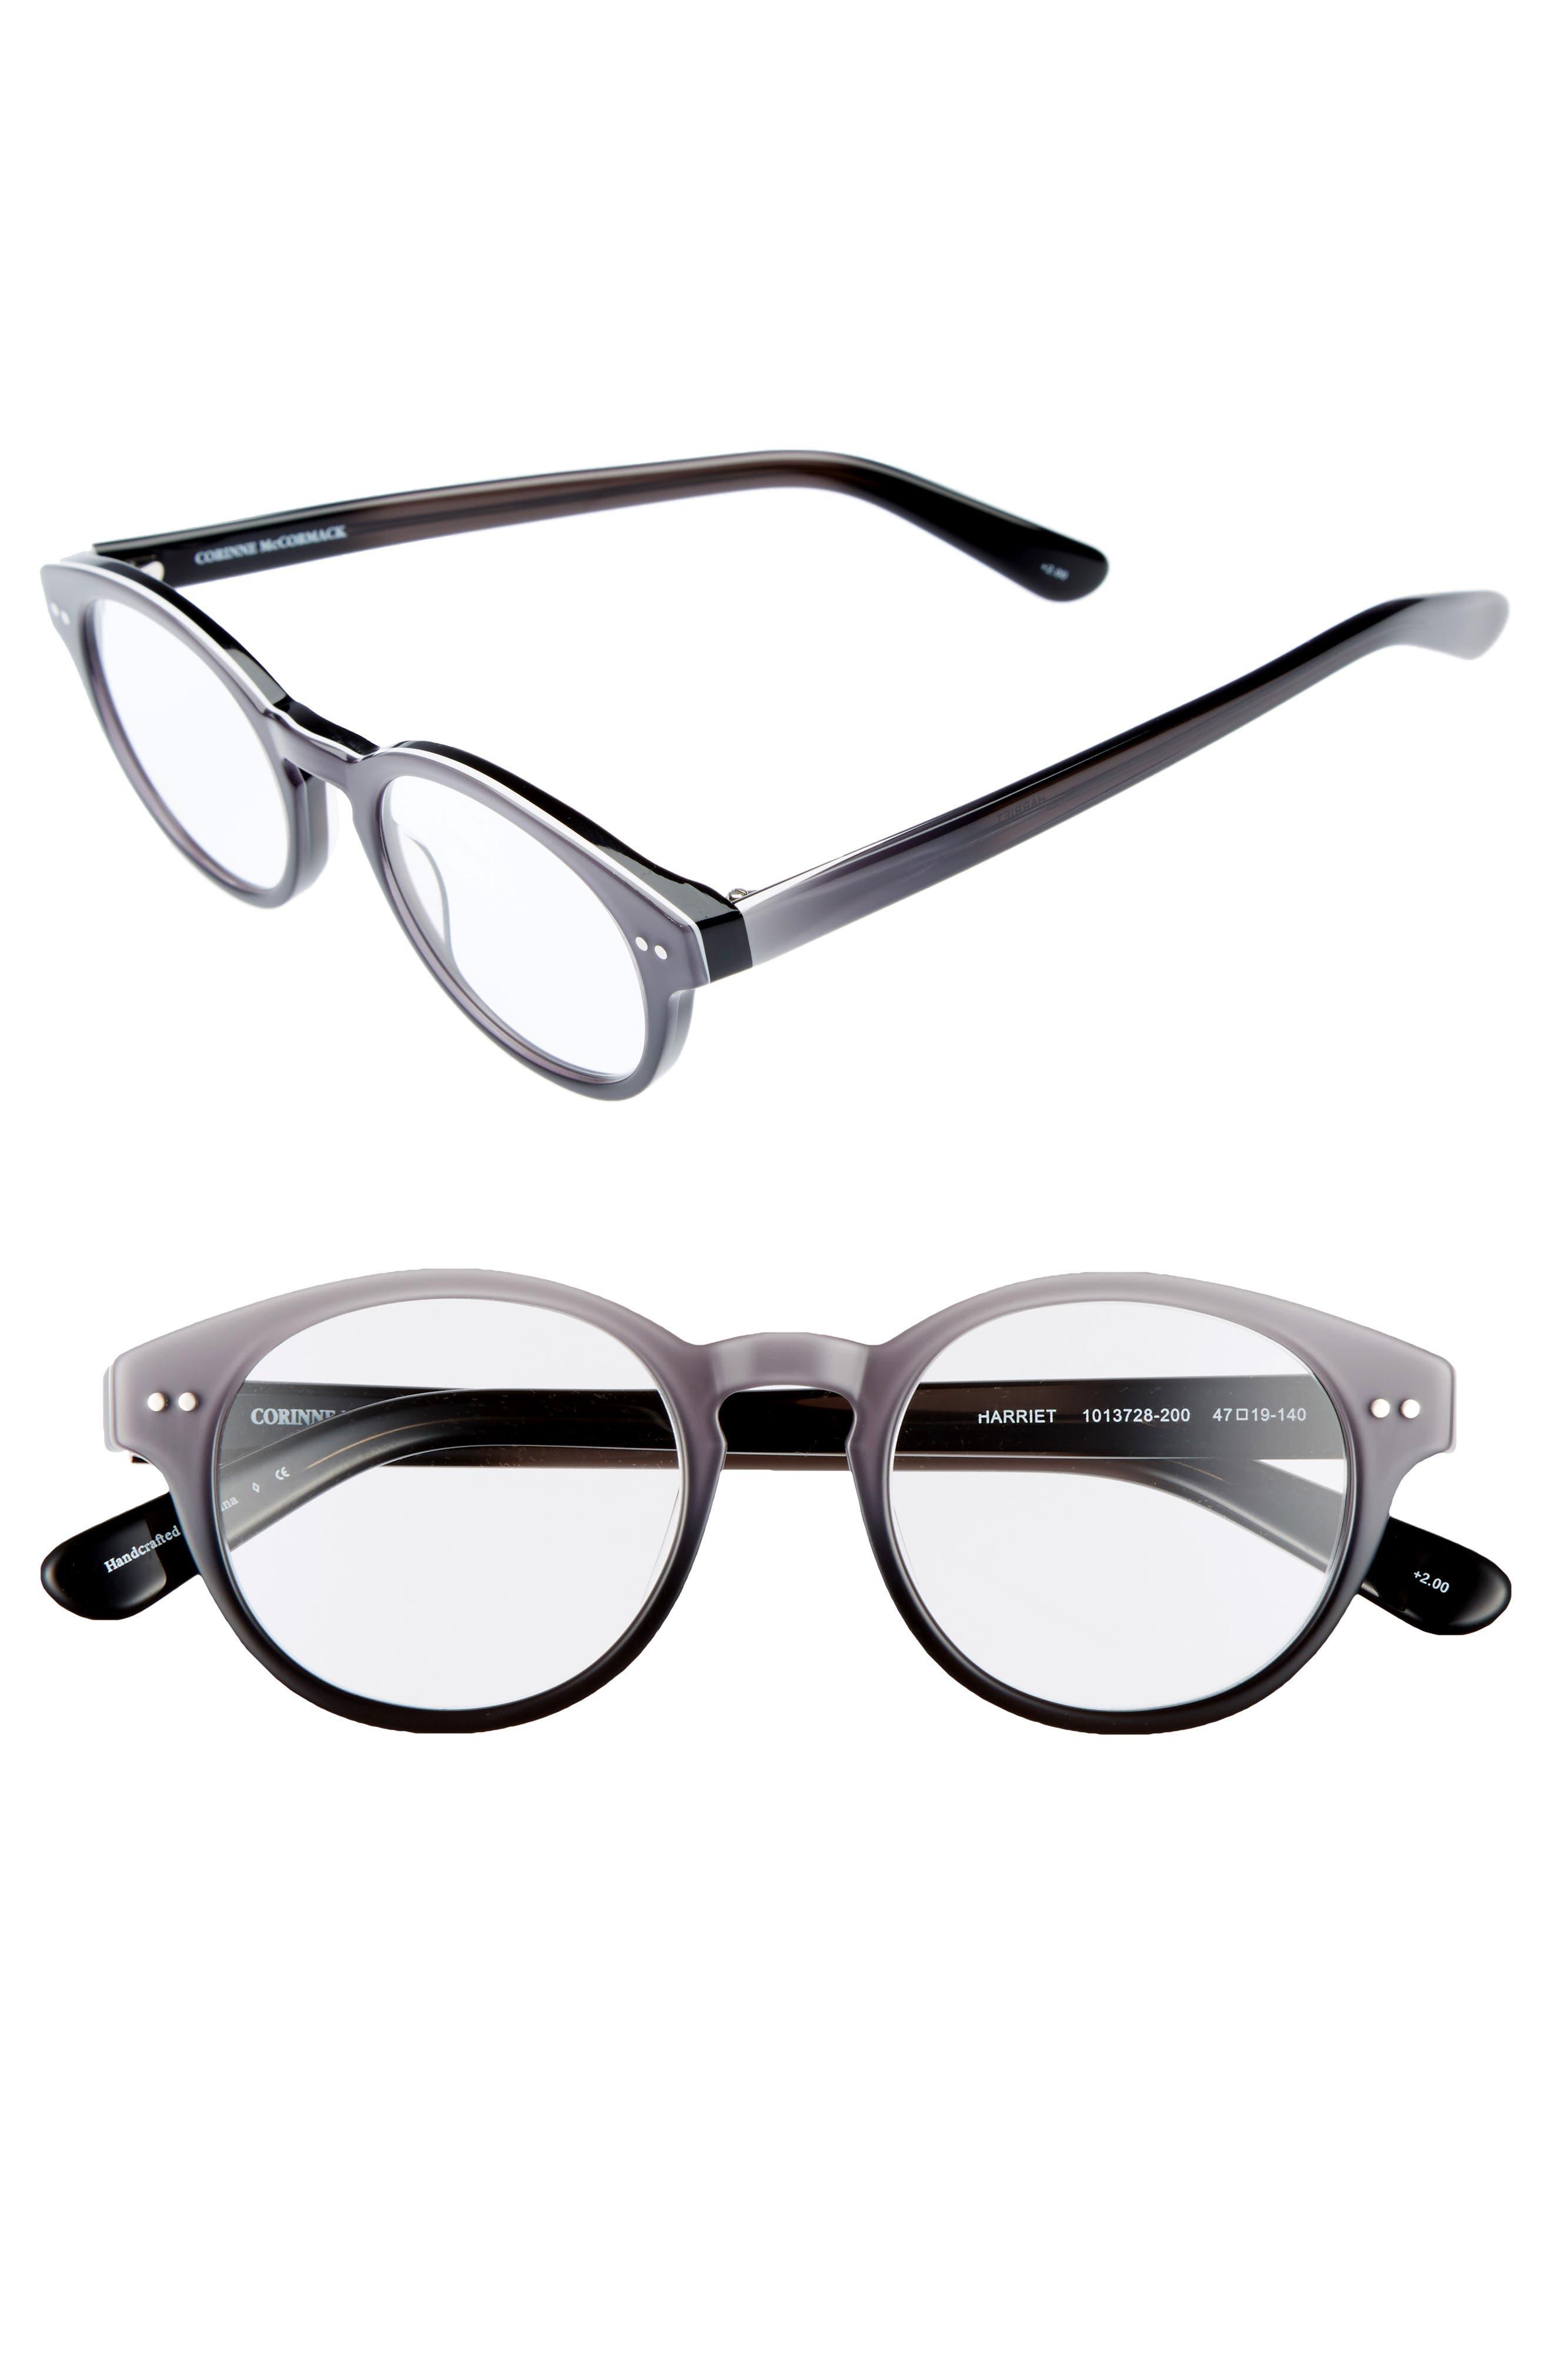 Corinne McCormack Harriet 50mm Reading Glasses